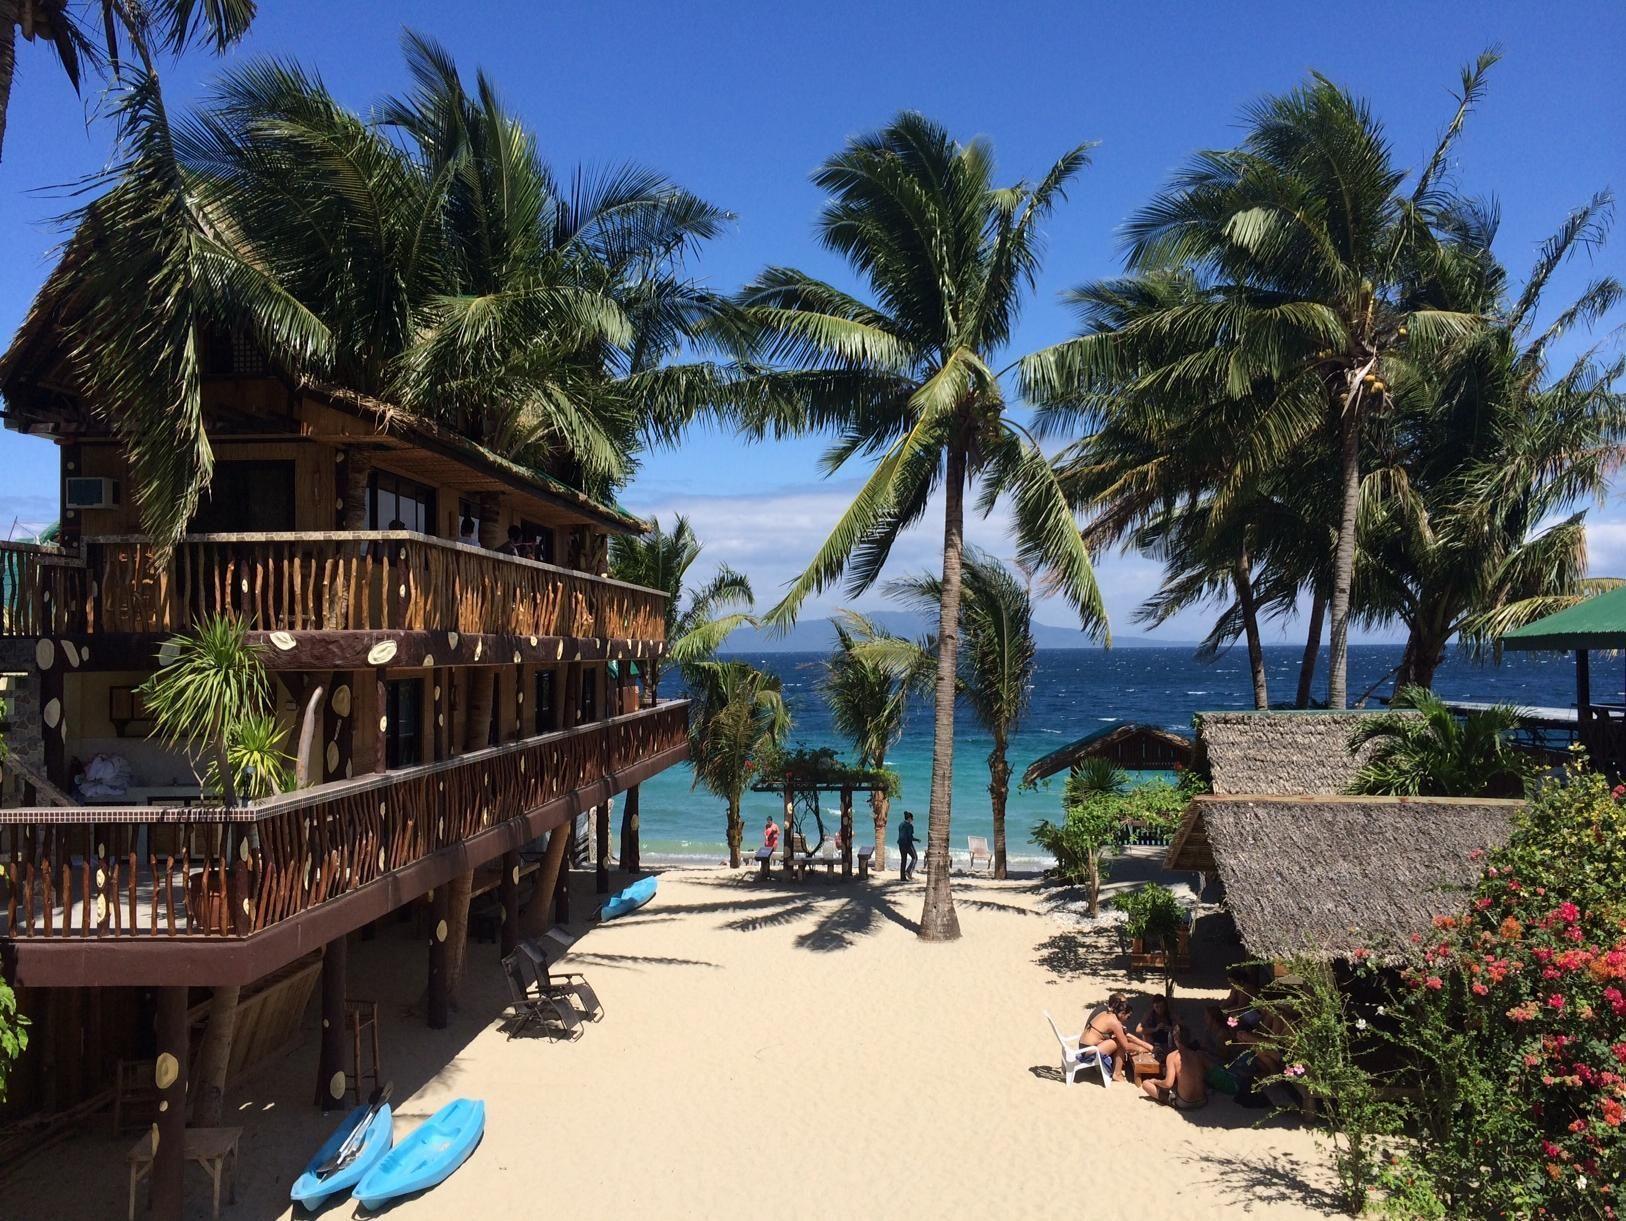 Puerto Galera Bamboo House Beach Lodge & Restaurant Philippines, Asia